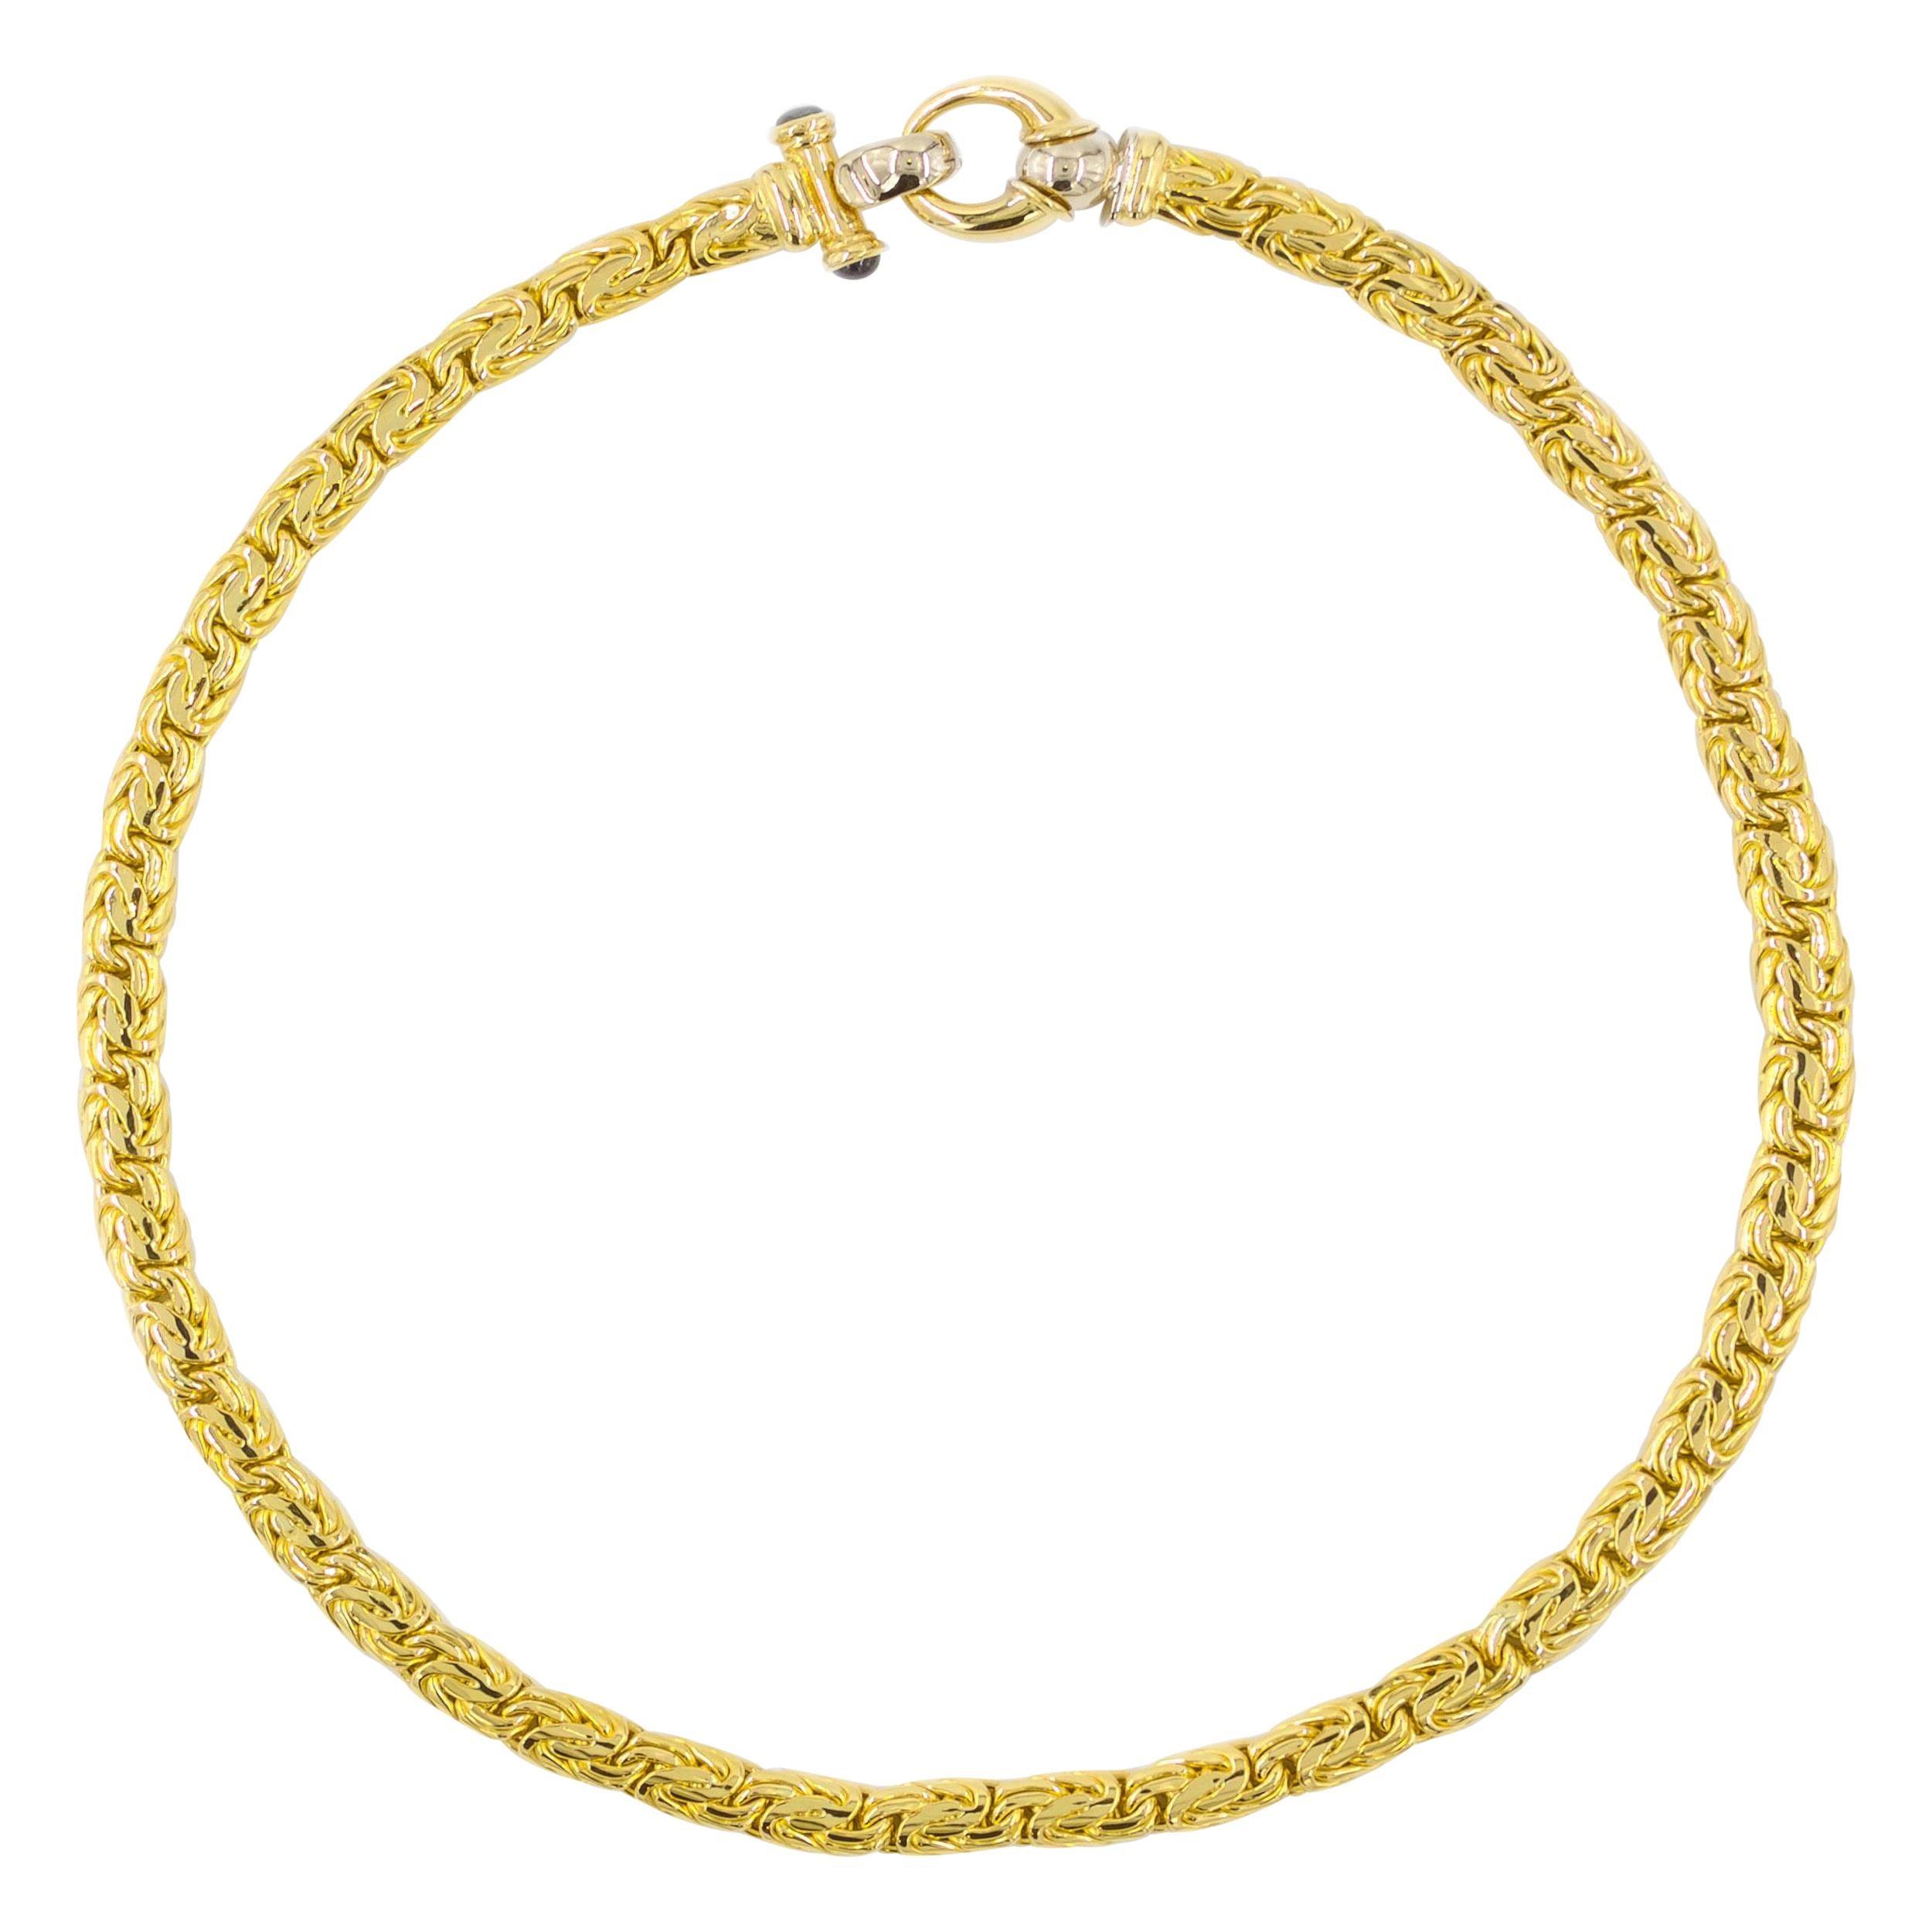 Italian 18k Yellow Gold Byzantine Necklace with Sapphire Gemstones